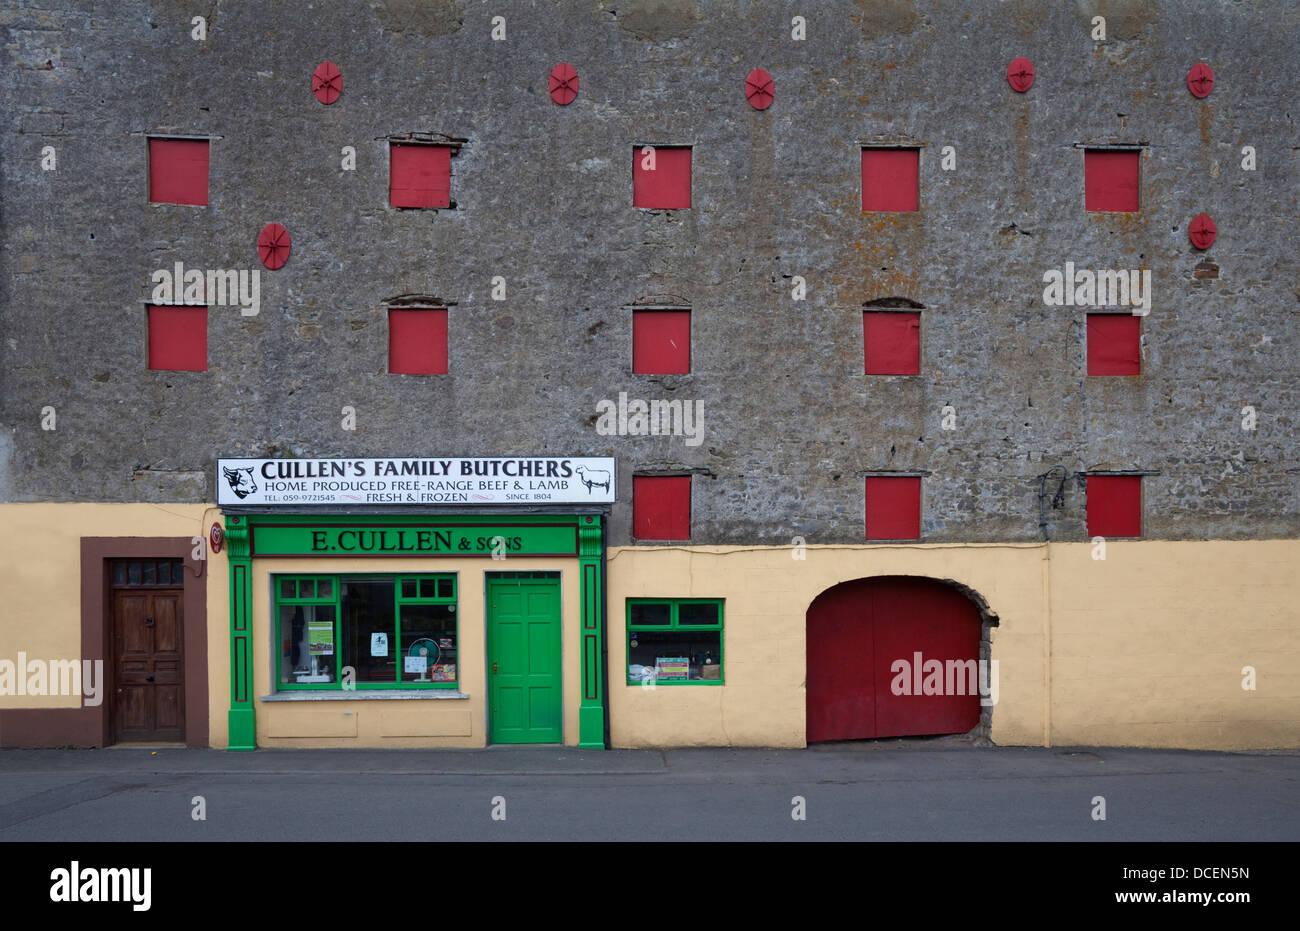 Traditional butchers Leighlinbridge, County Carlow, Ireland - Stock Image